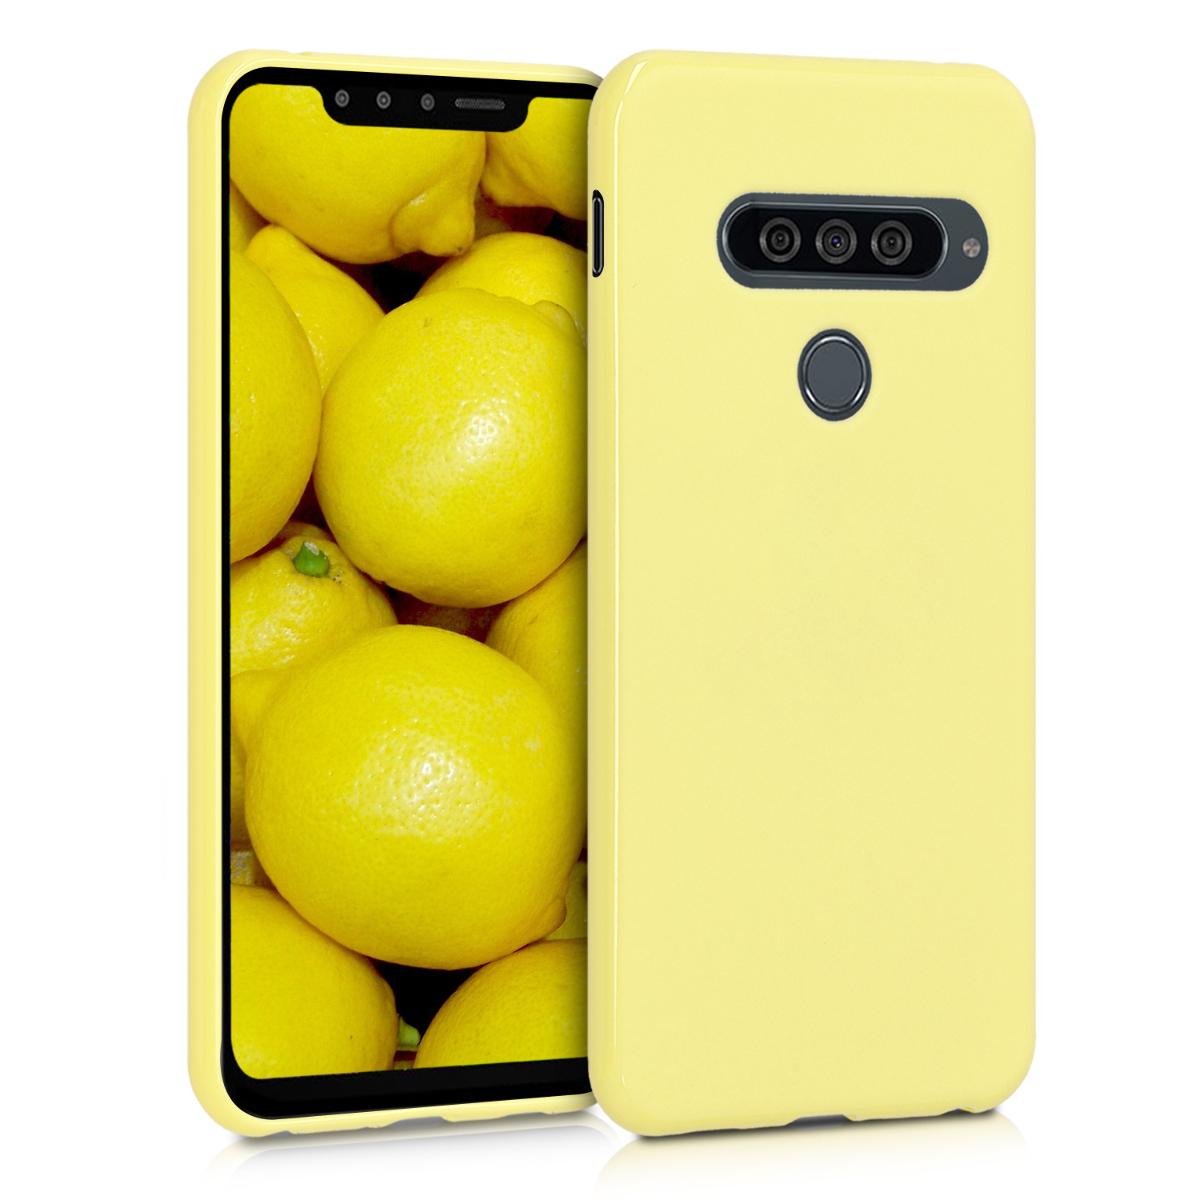 KW Θήκη Σιλικόνης LG G8s ThinQ - Yellow Matte (48068.49)